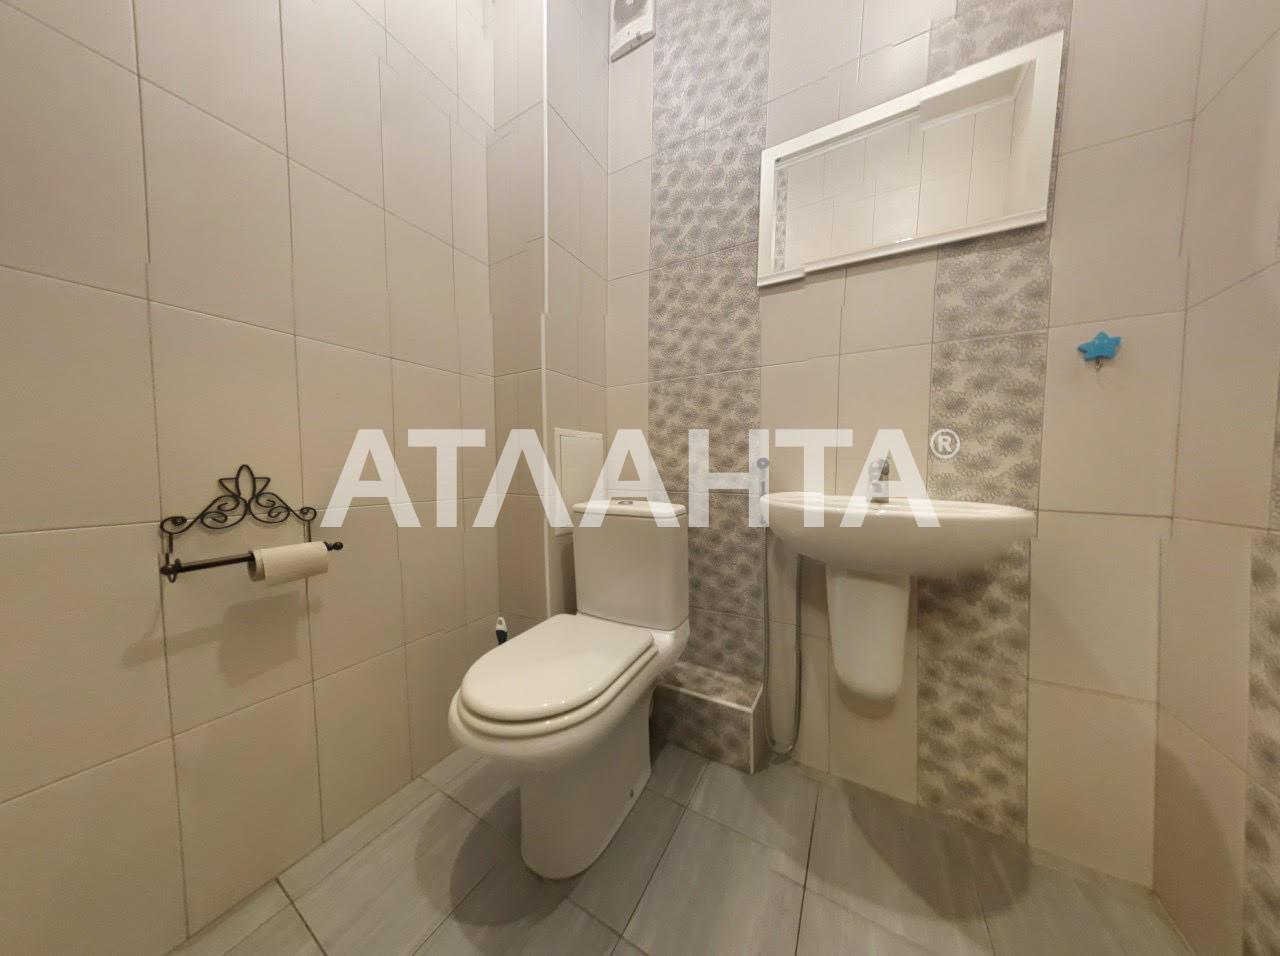 Продается 2-комнатная Квартира на ул. Ул. Ломоносова — 103 000 у.е. (фото №13)